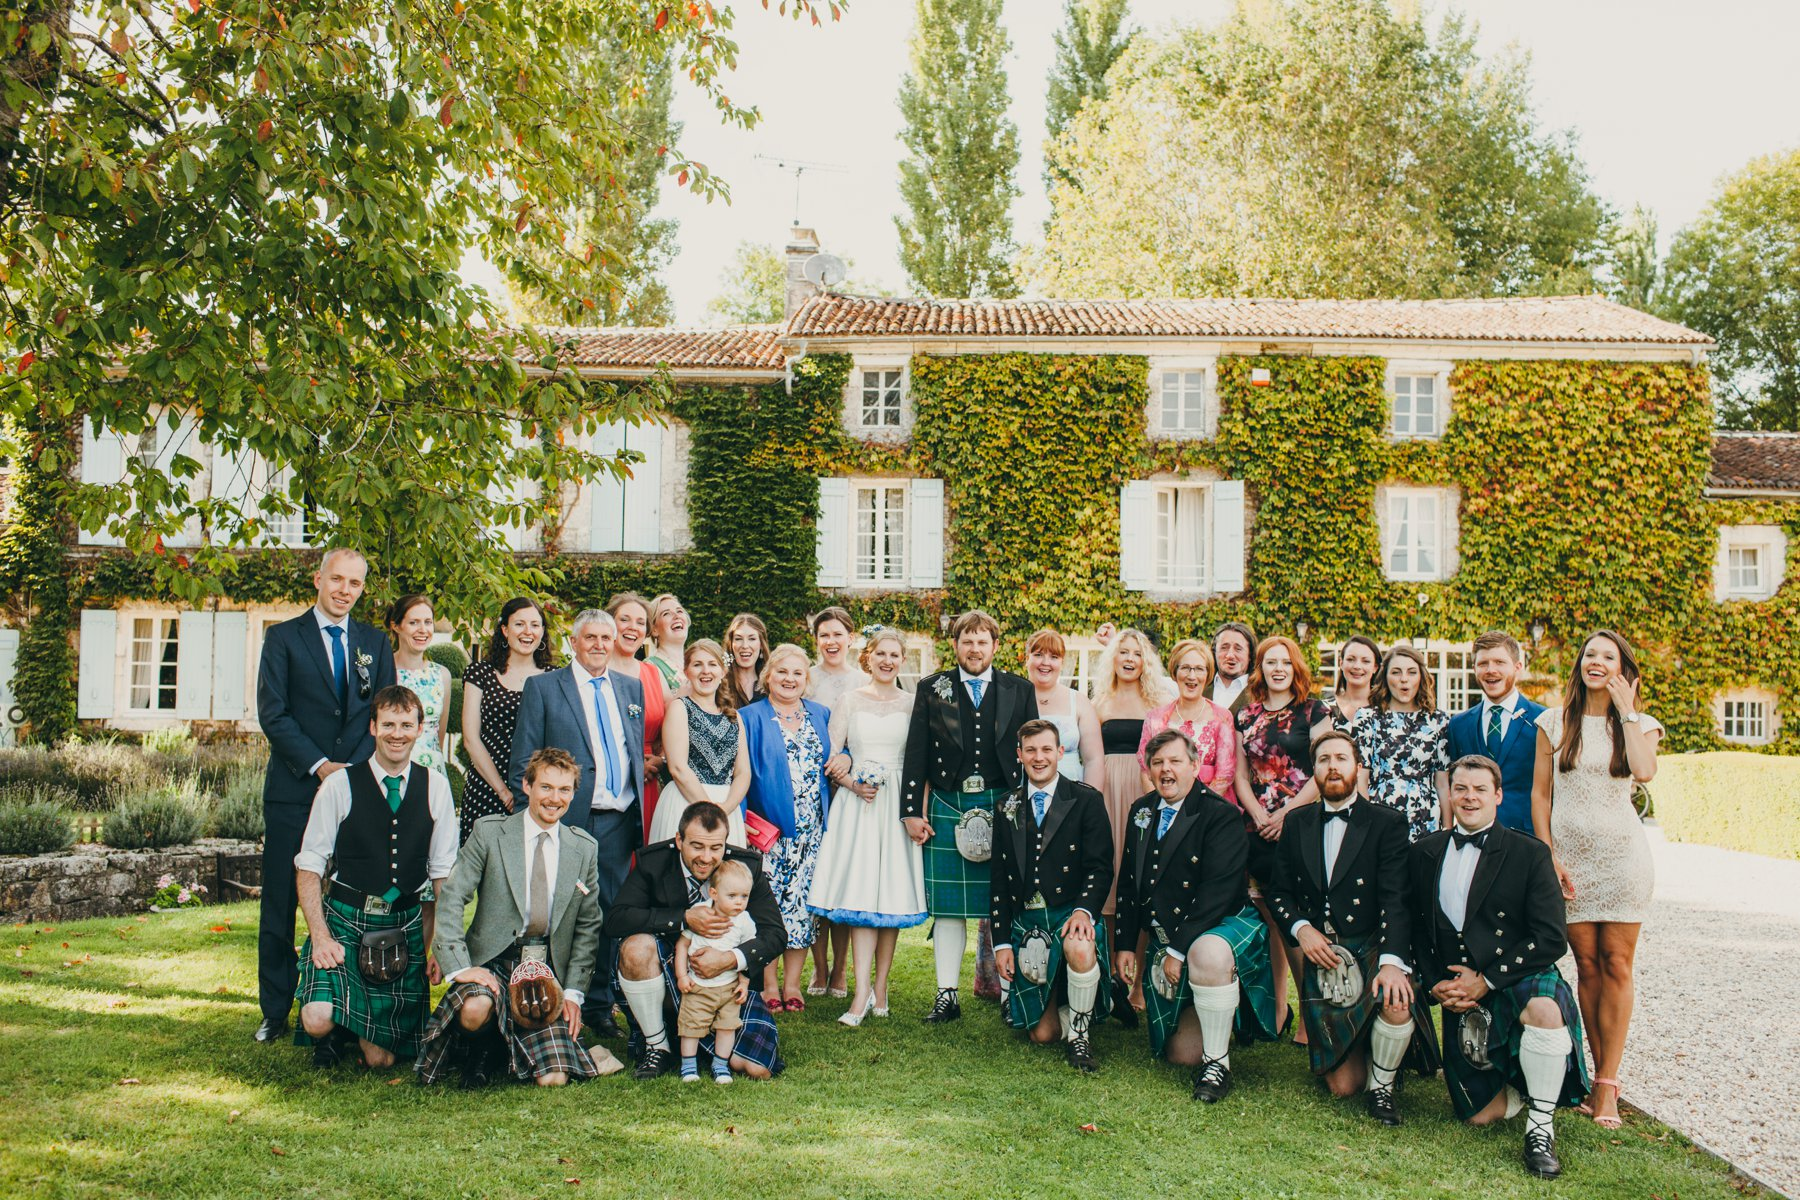 petitmoulin_france_bordeaux_weddings_0087